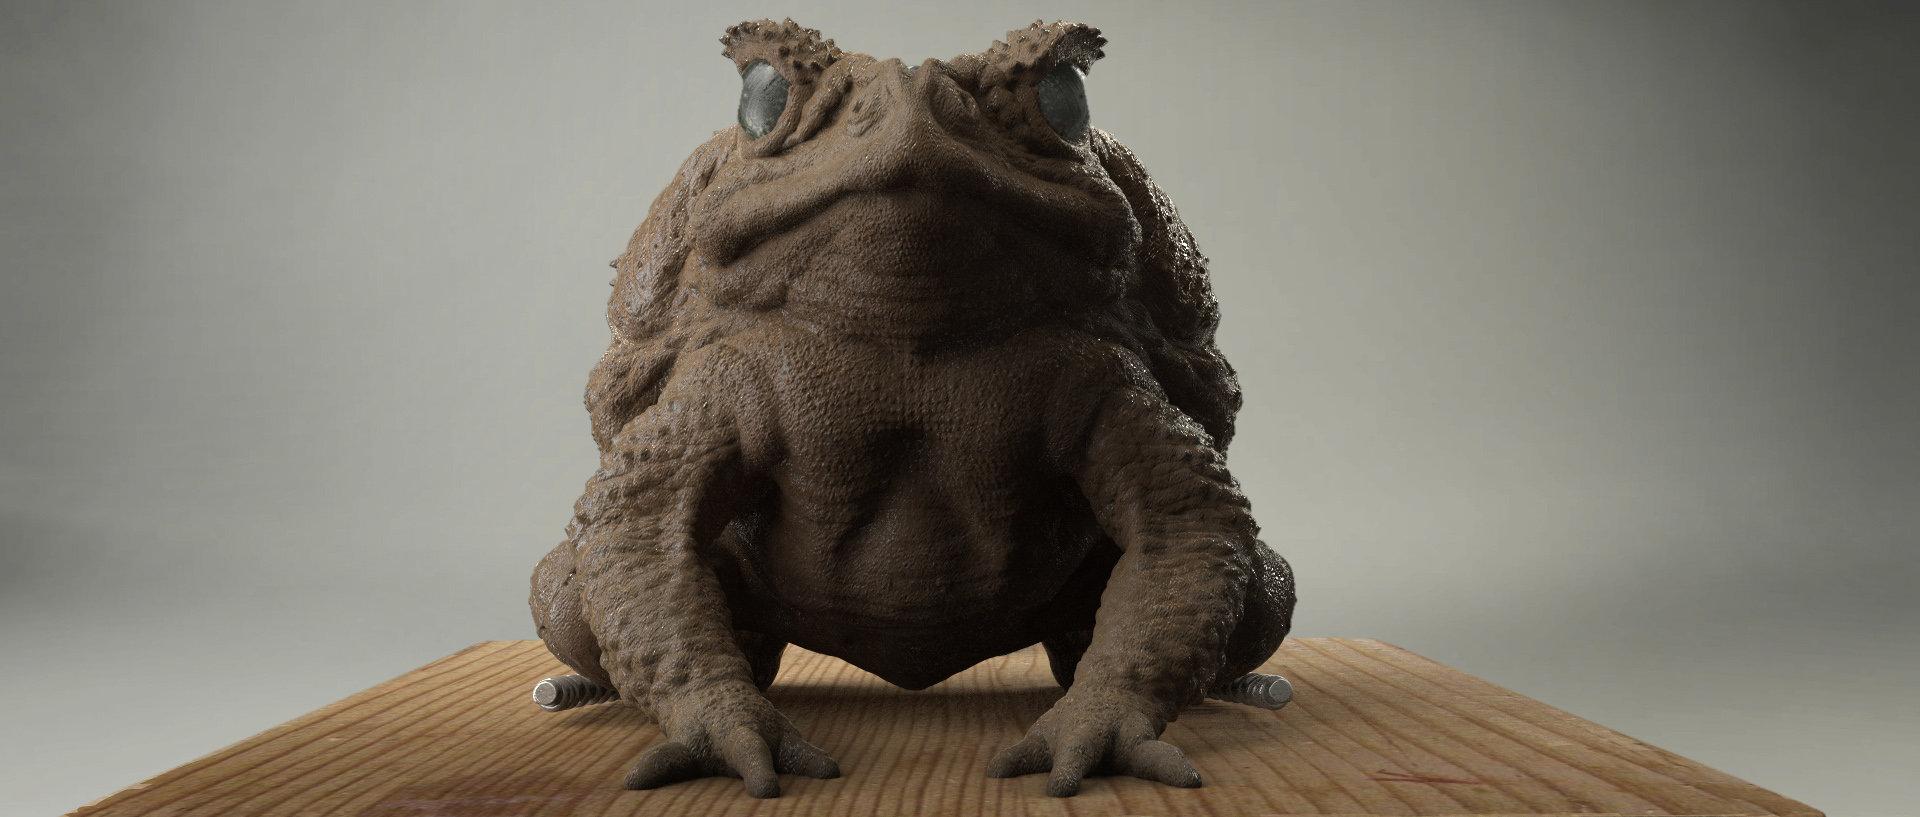 Jin hao villa toad frntal fin